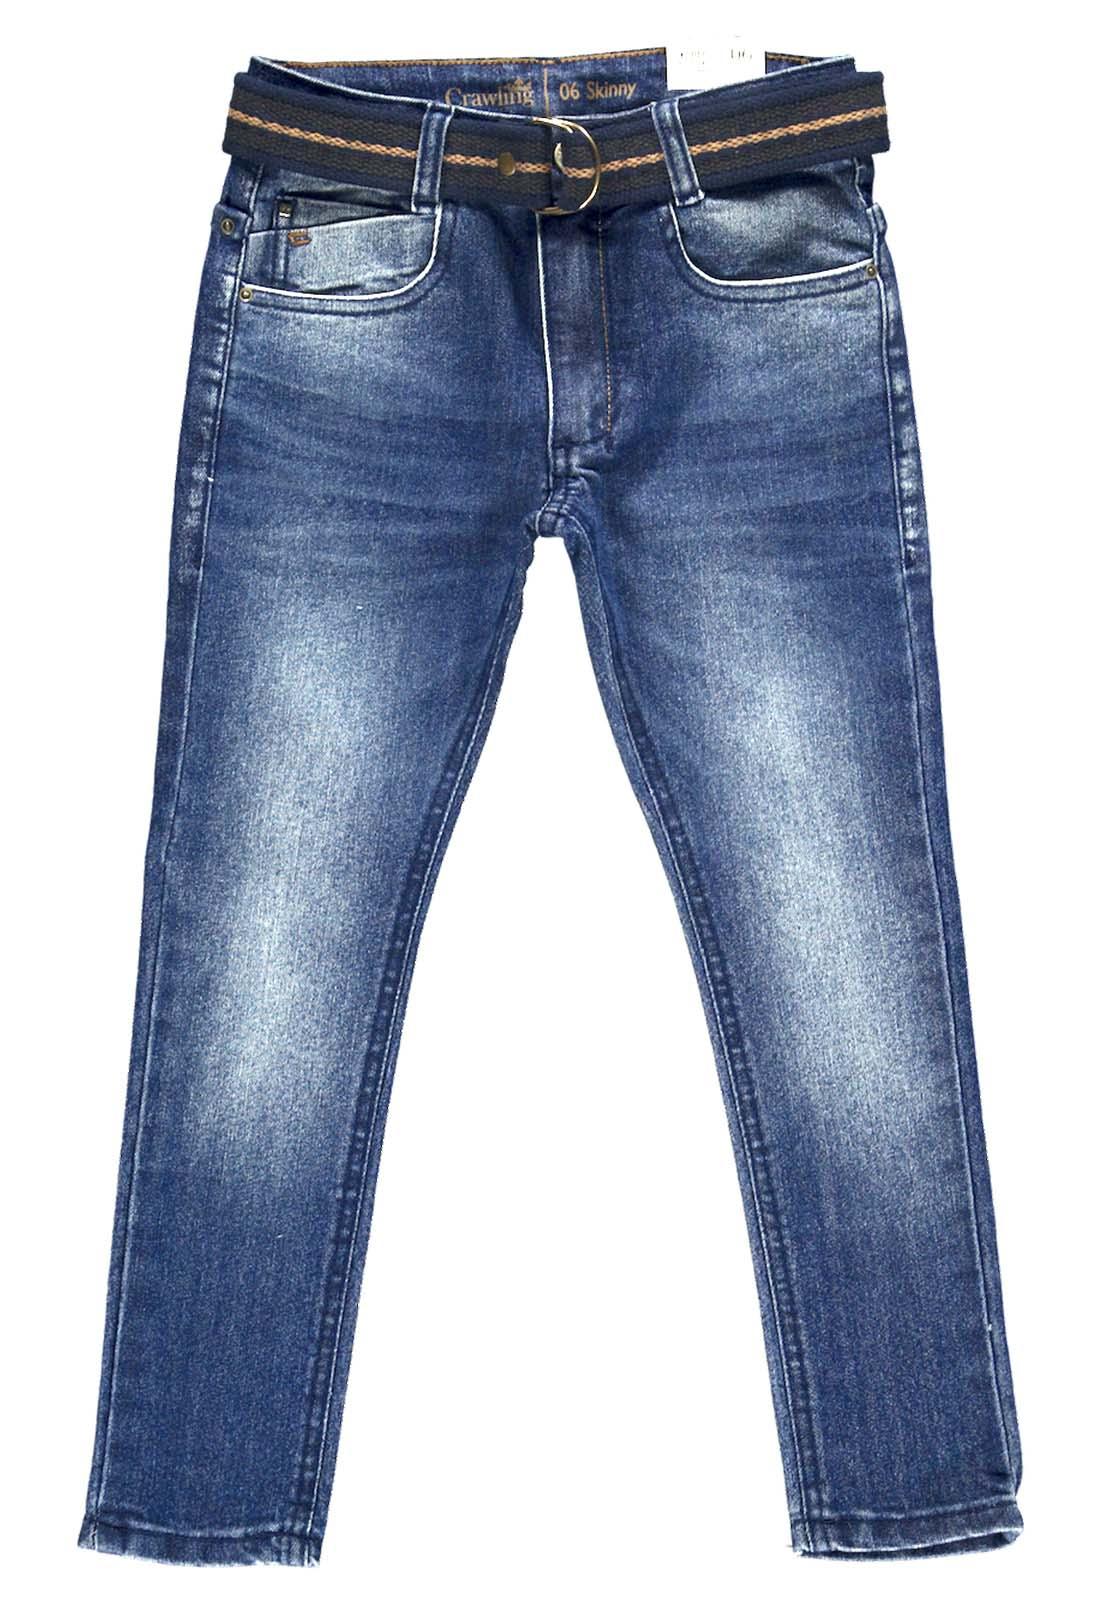 Calça Masculina C/Cinto Crawling Skinny Jeans